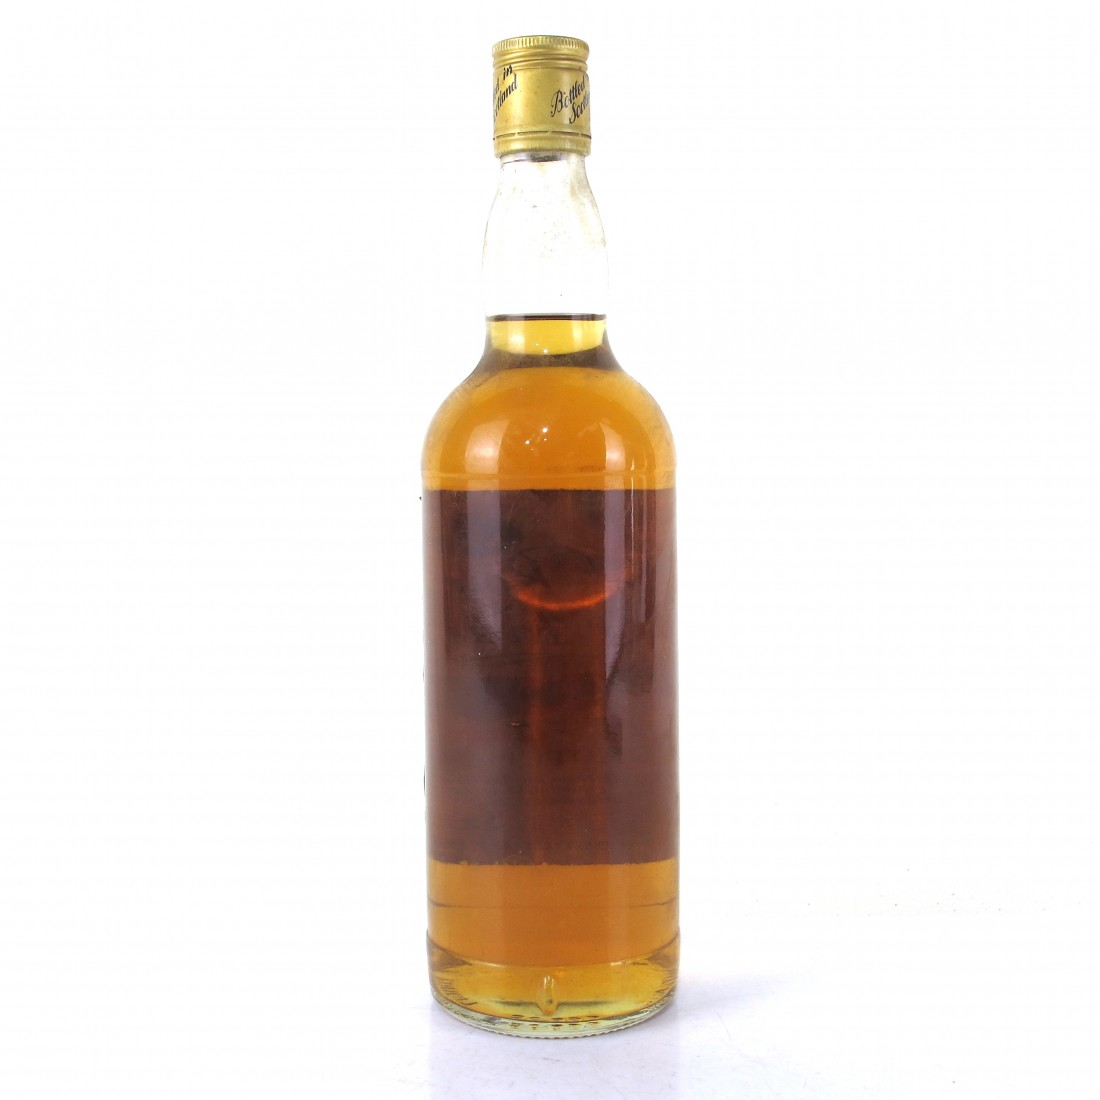 Royal Award Scotch Whisky 1980s / Littlemill